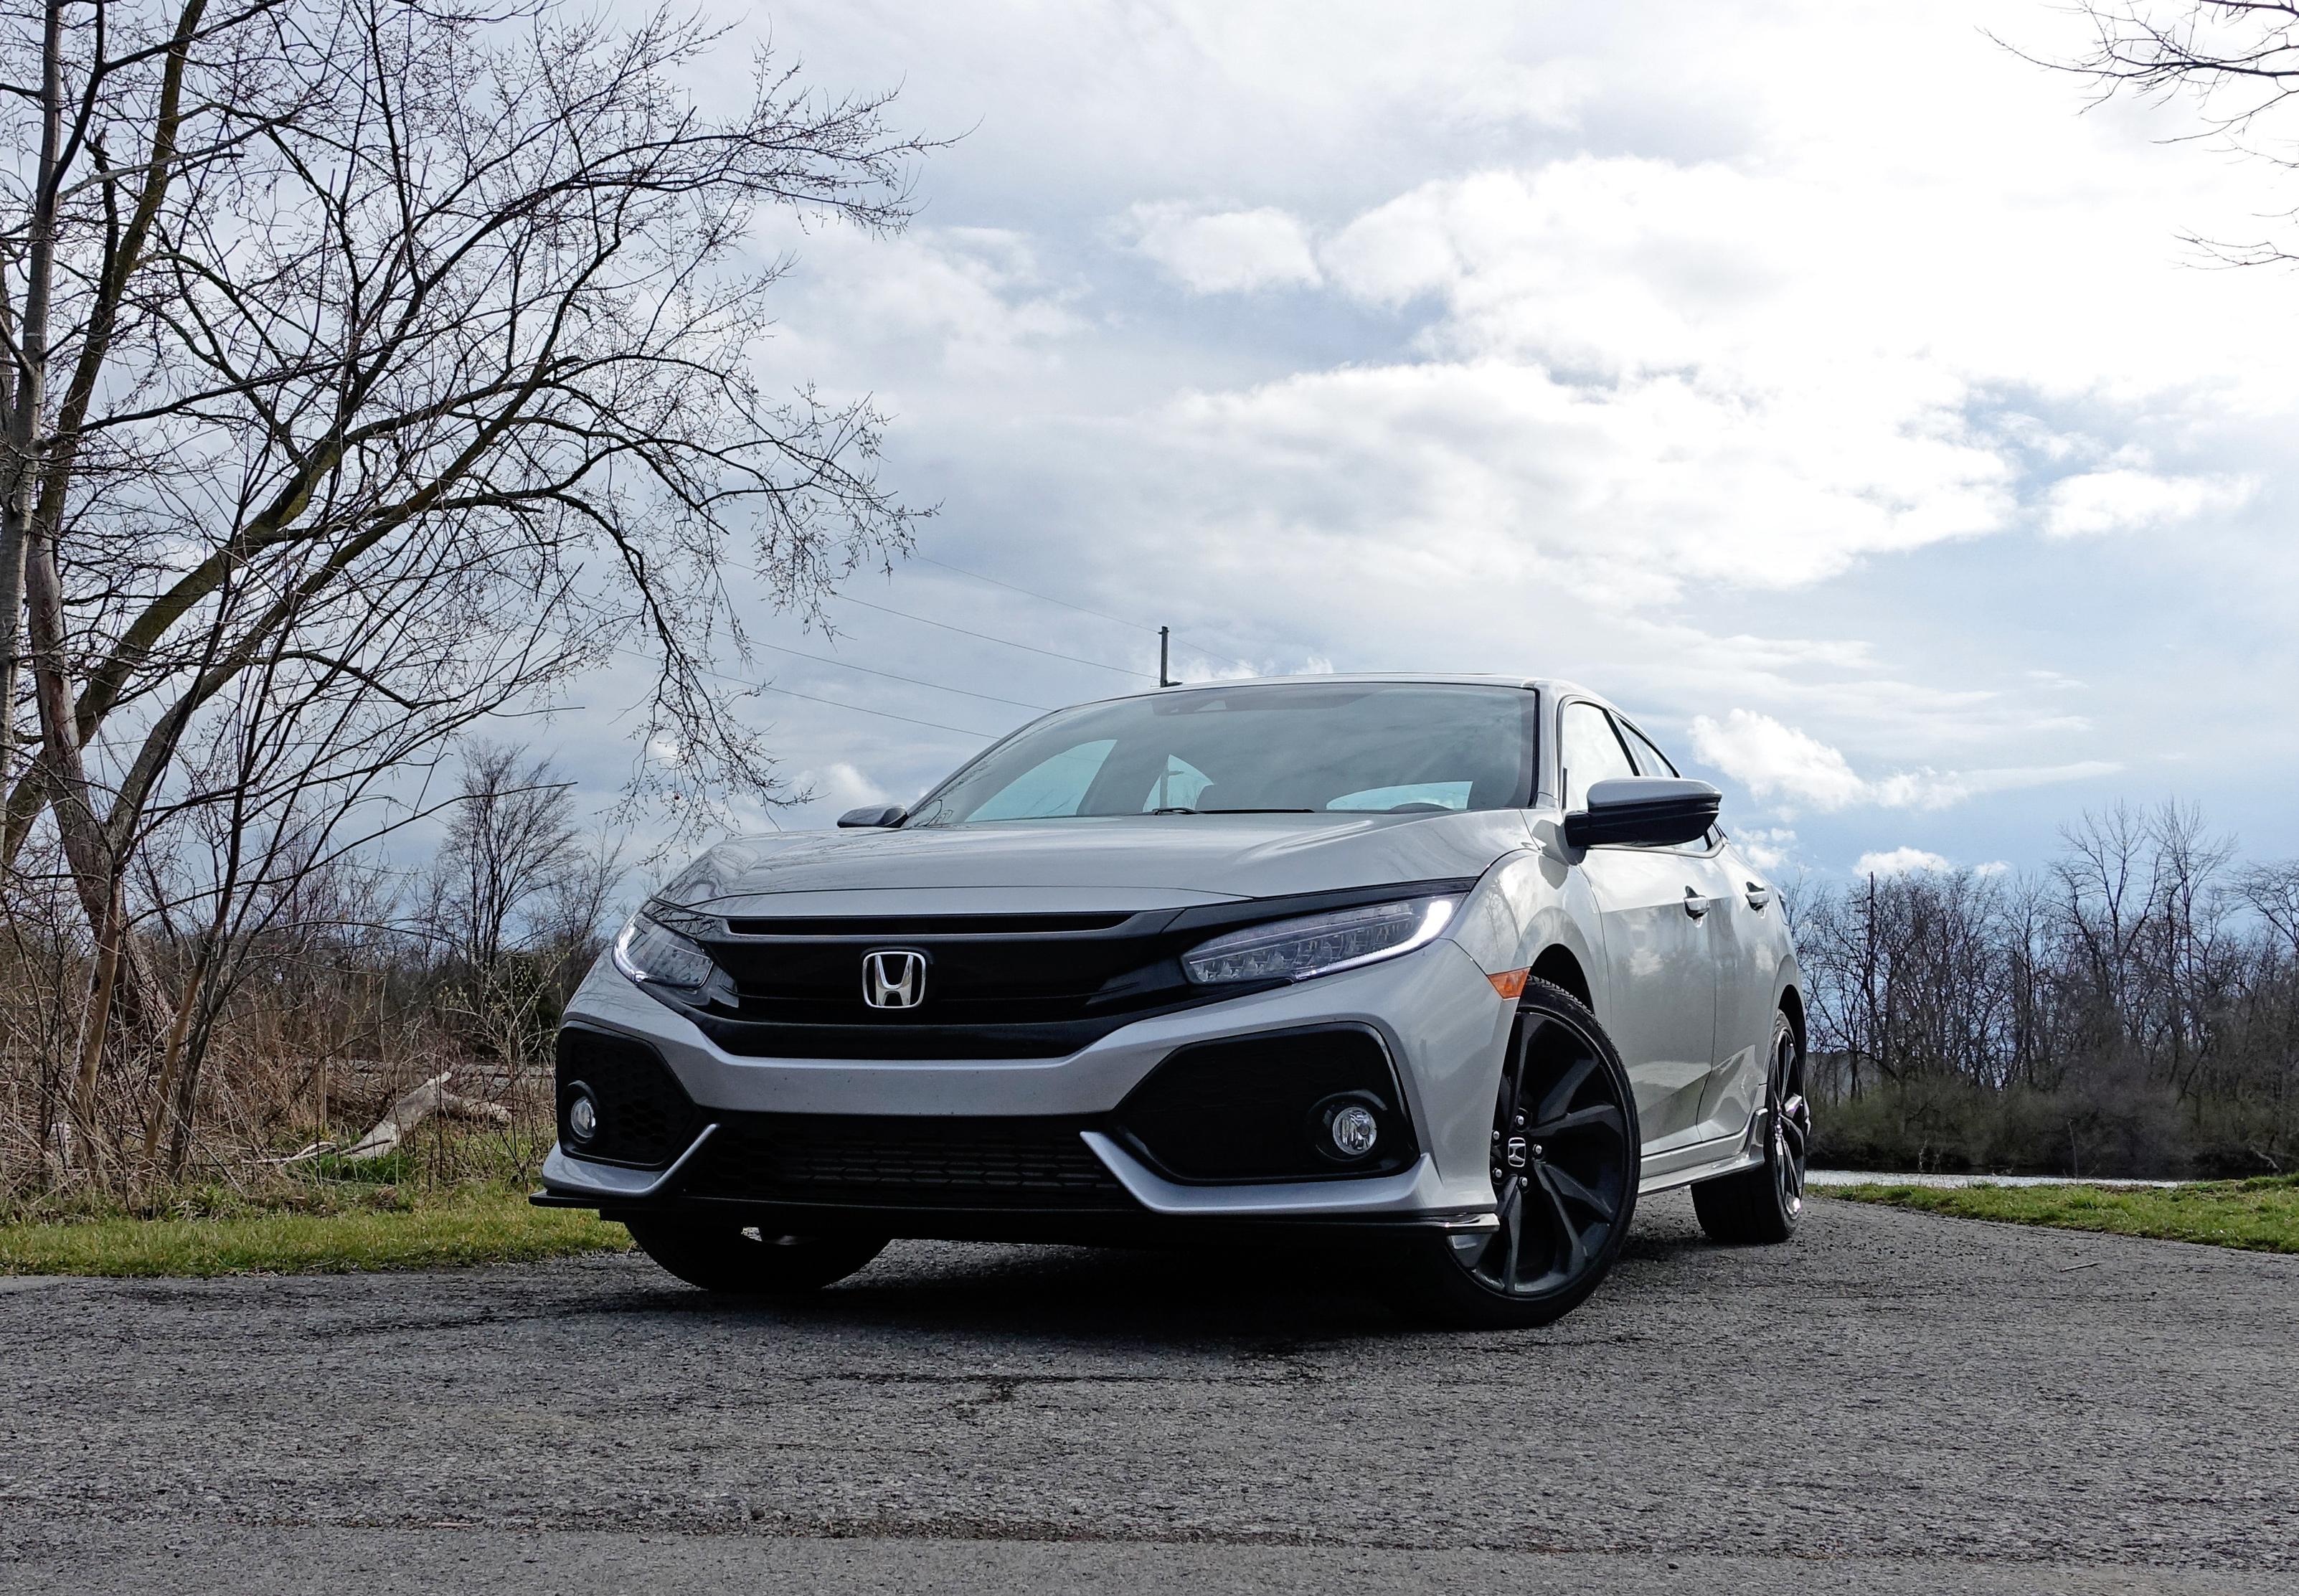 2017 Honda Civic Hatchback Sport Touring Review